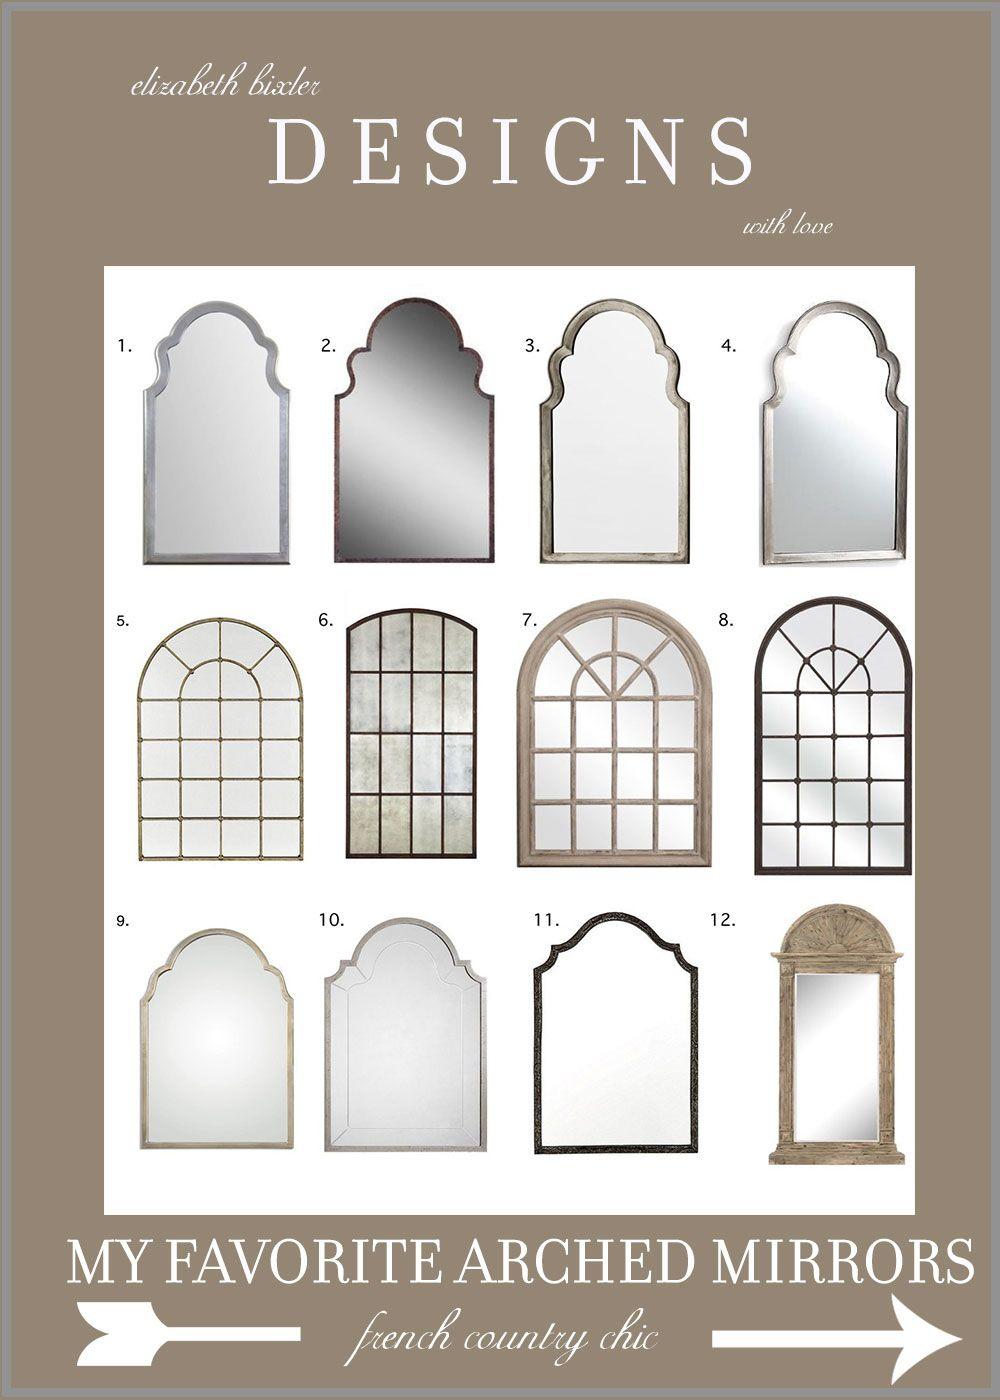 My Favorite Arch Mirrors | | Elizabeth Bixler Designs Regarding Arch Vertical Wall Mirrors (View 18 of 30)